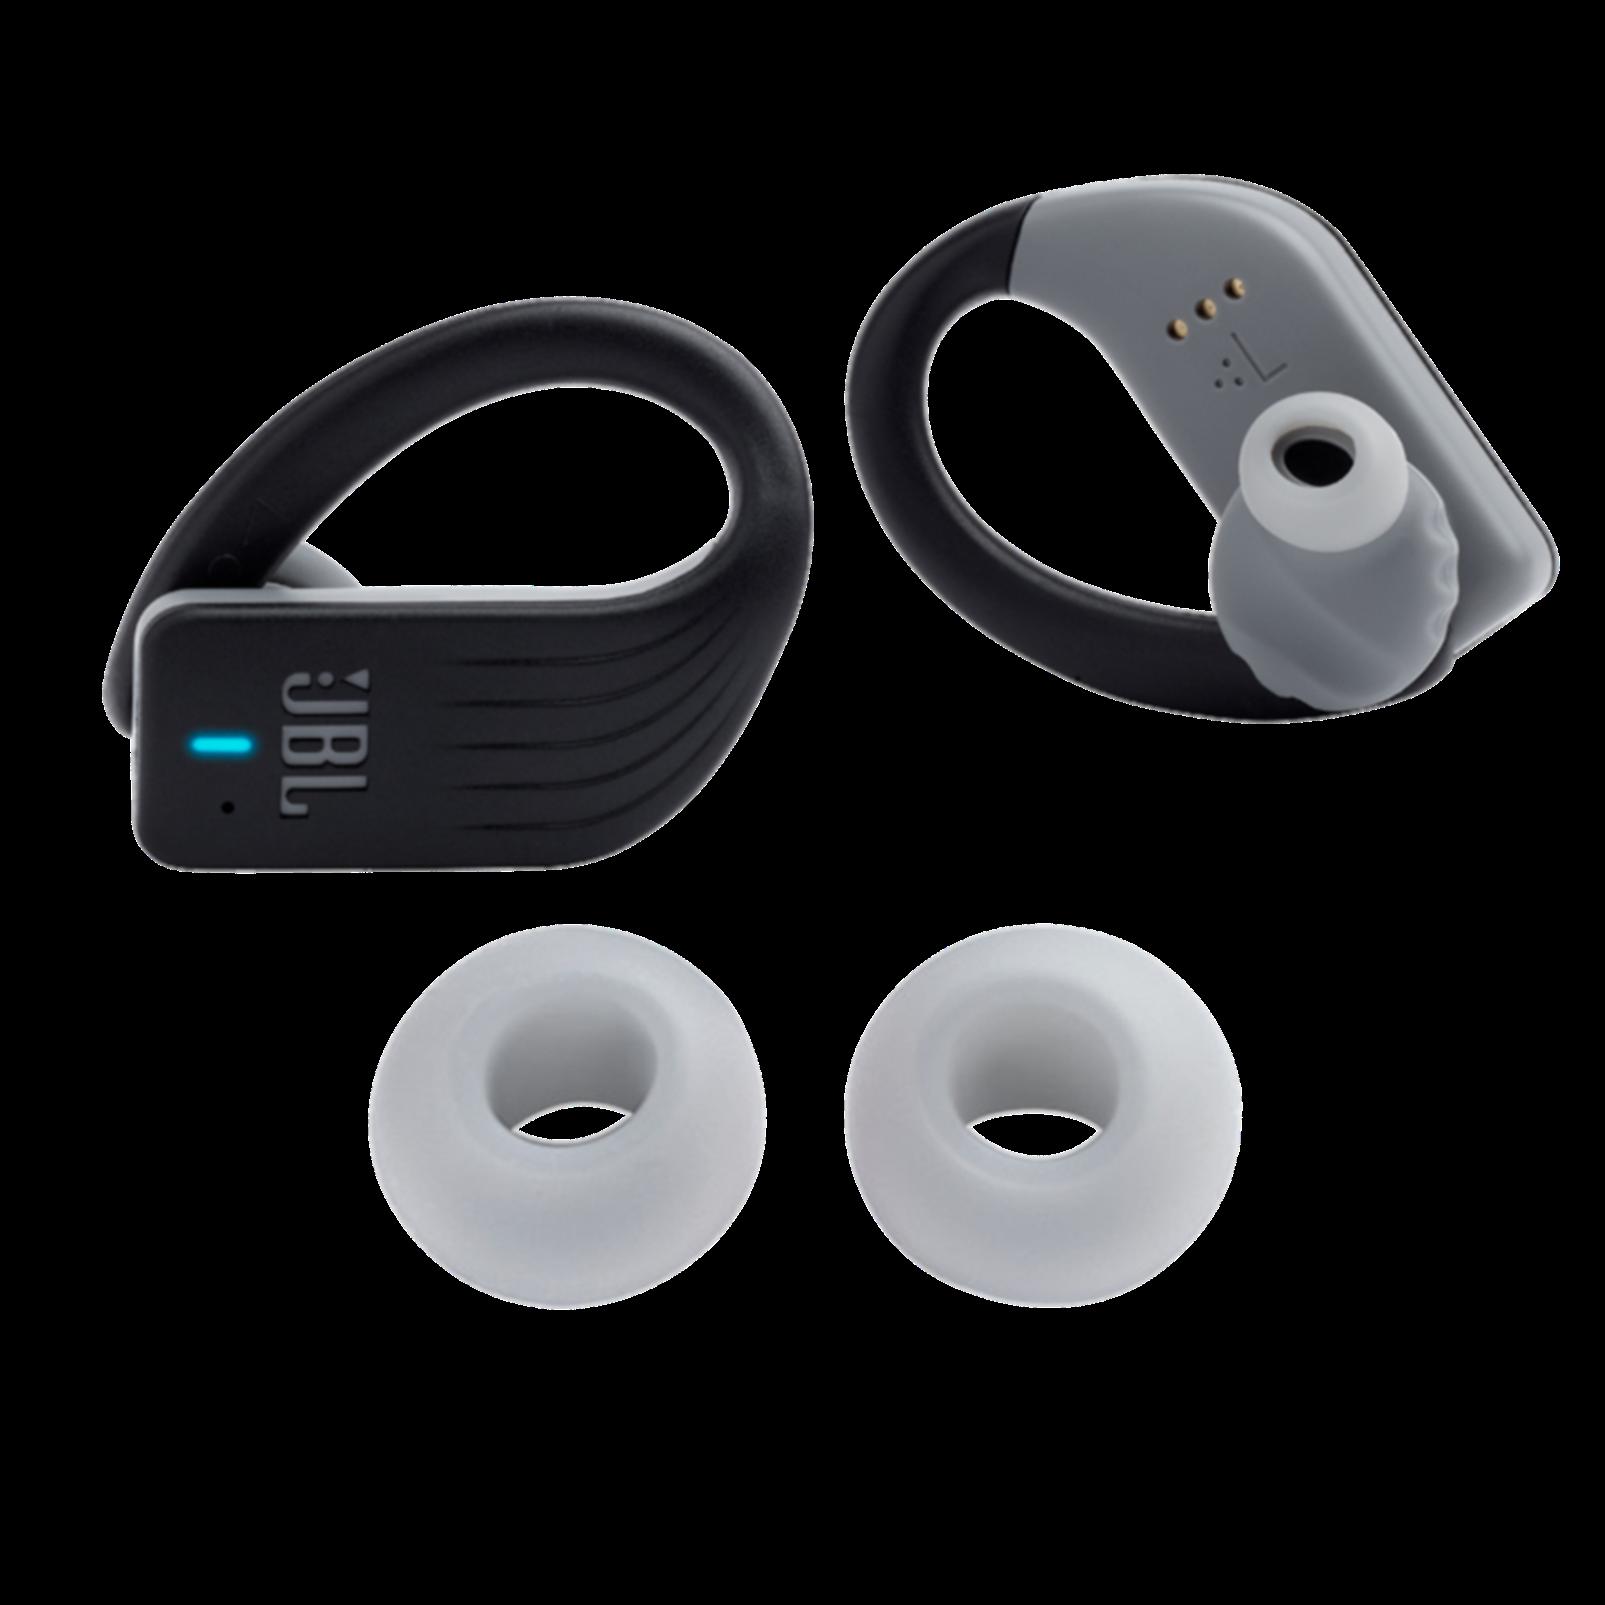 JBL Endurance PEAK replacement kit - Black - Ear buds, ear tips and enhancers - Hero